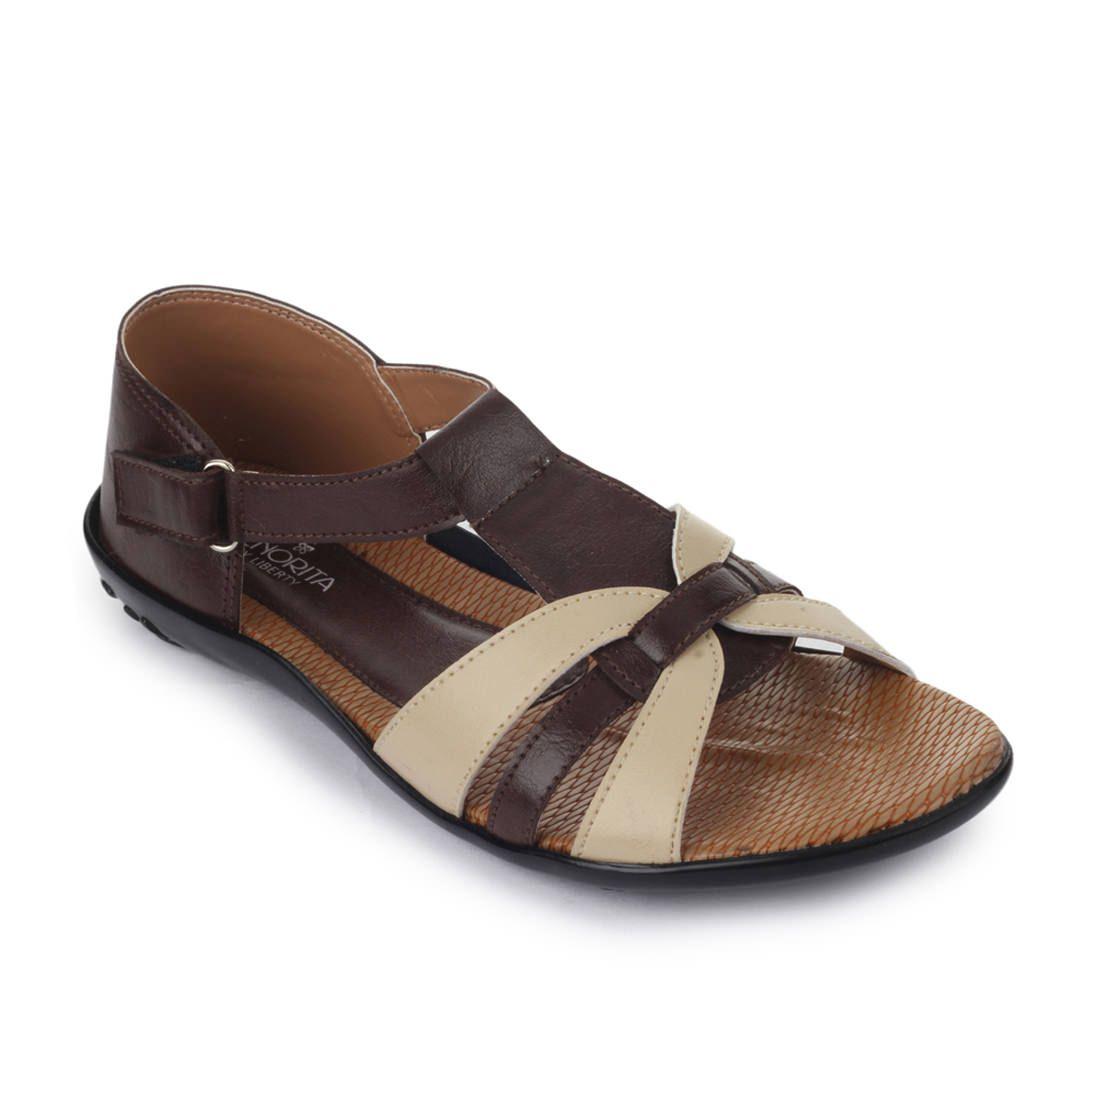 SENORITA Brown Flats